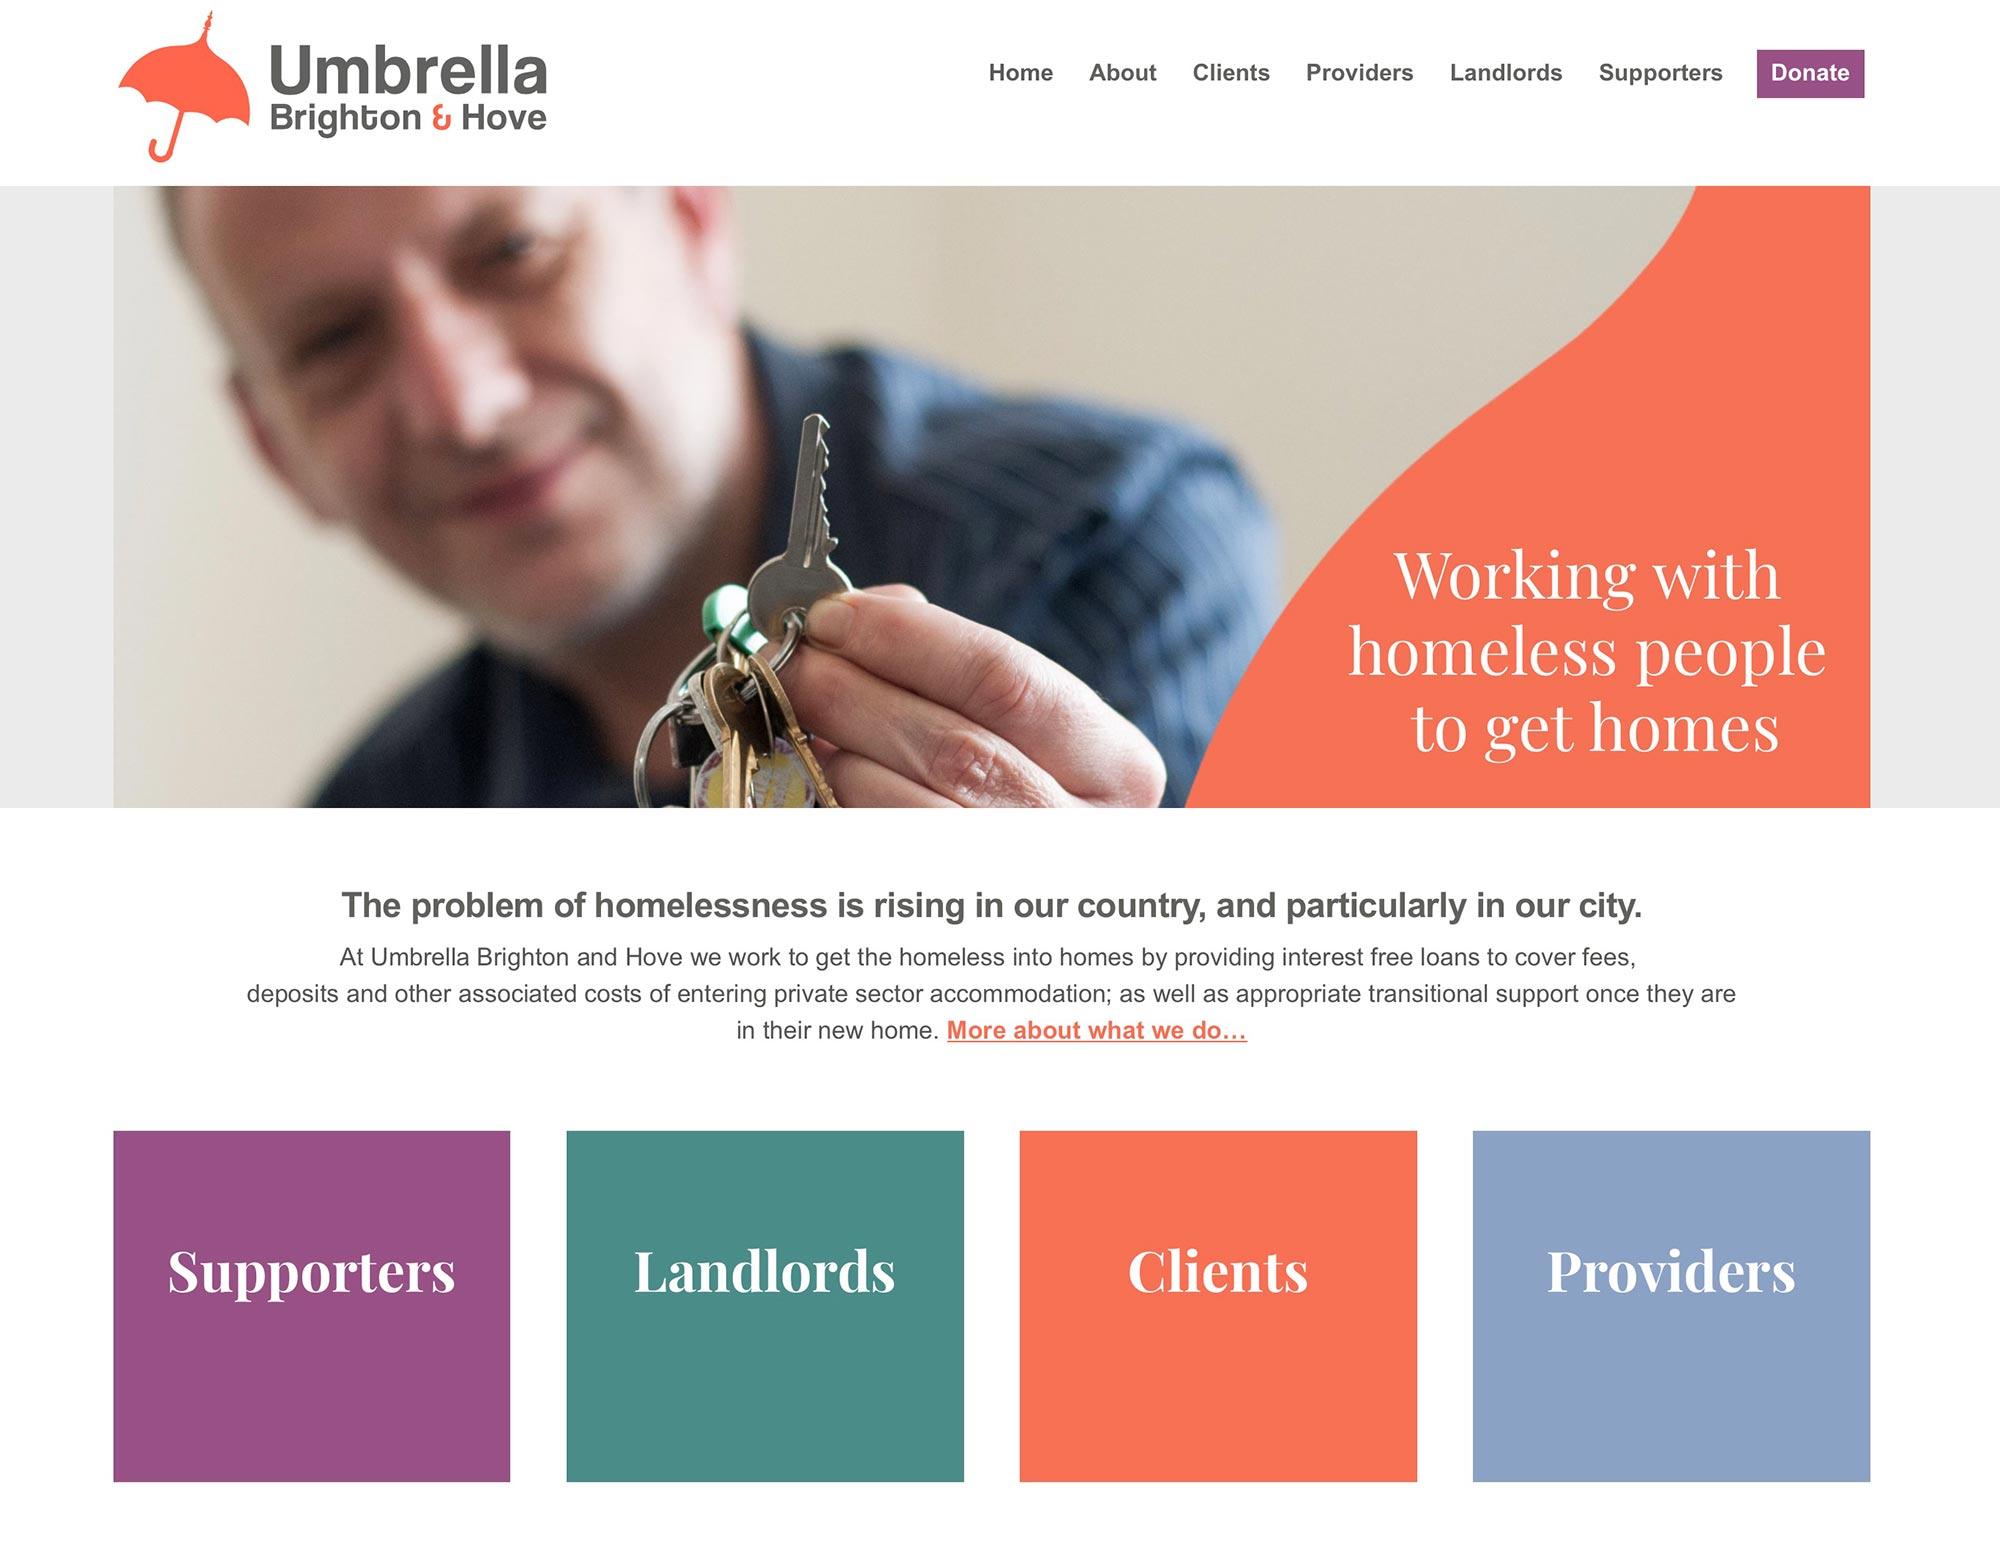 Umbrealla homeless charity Brighton